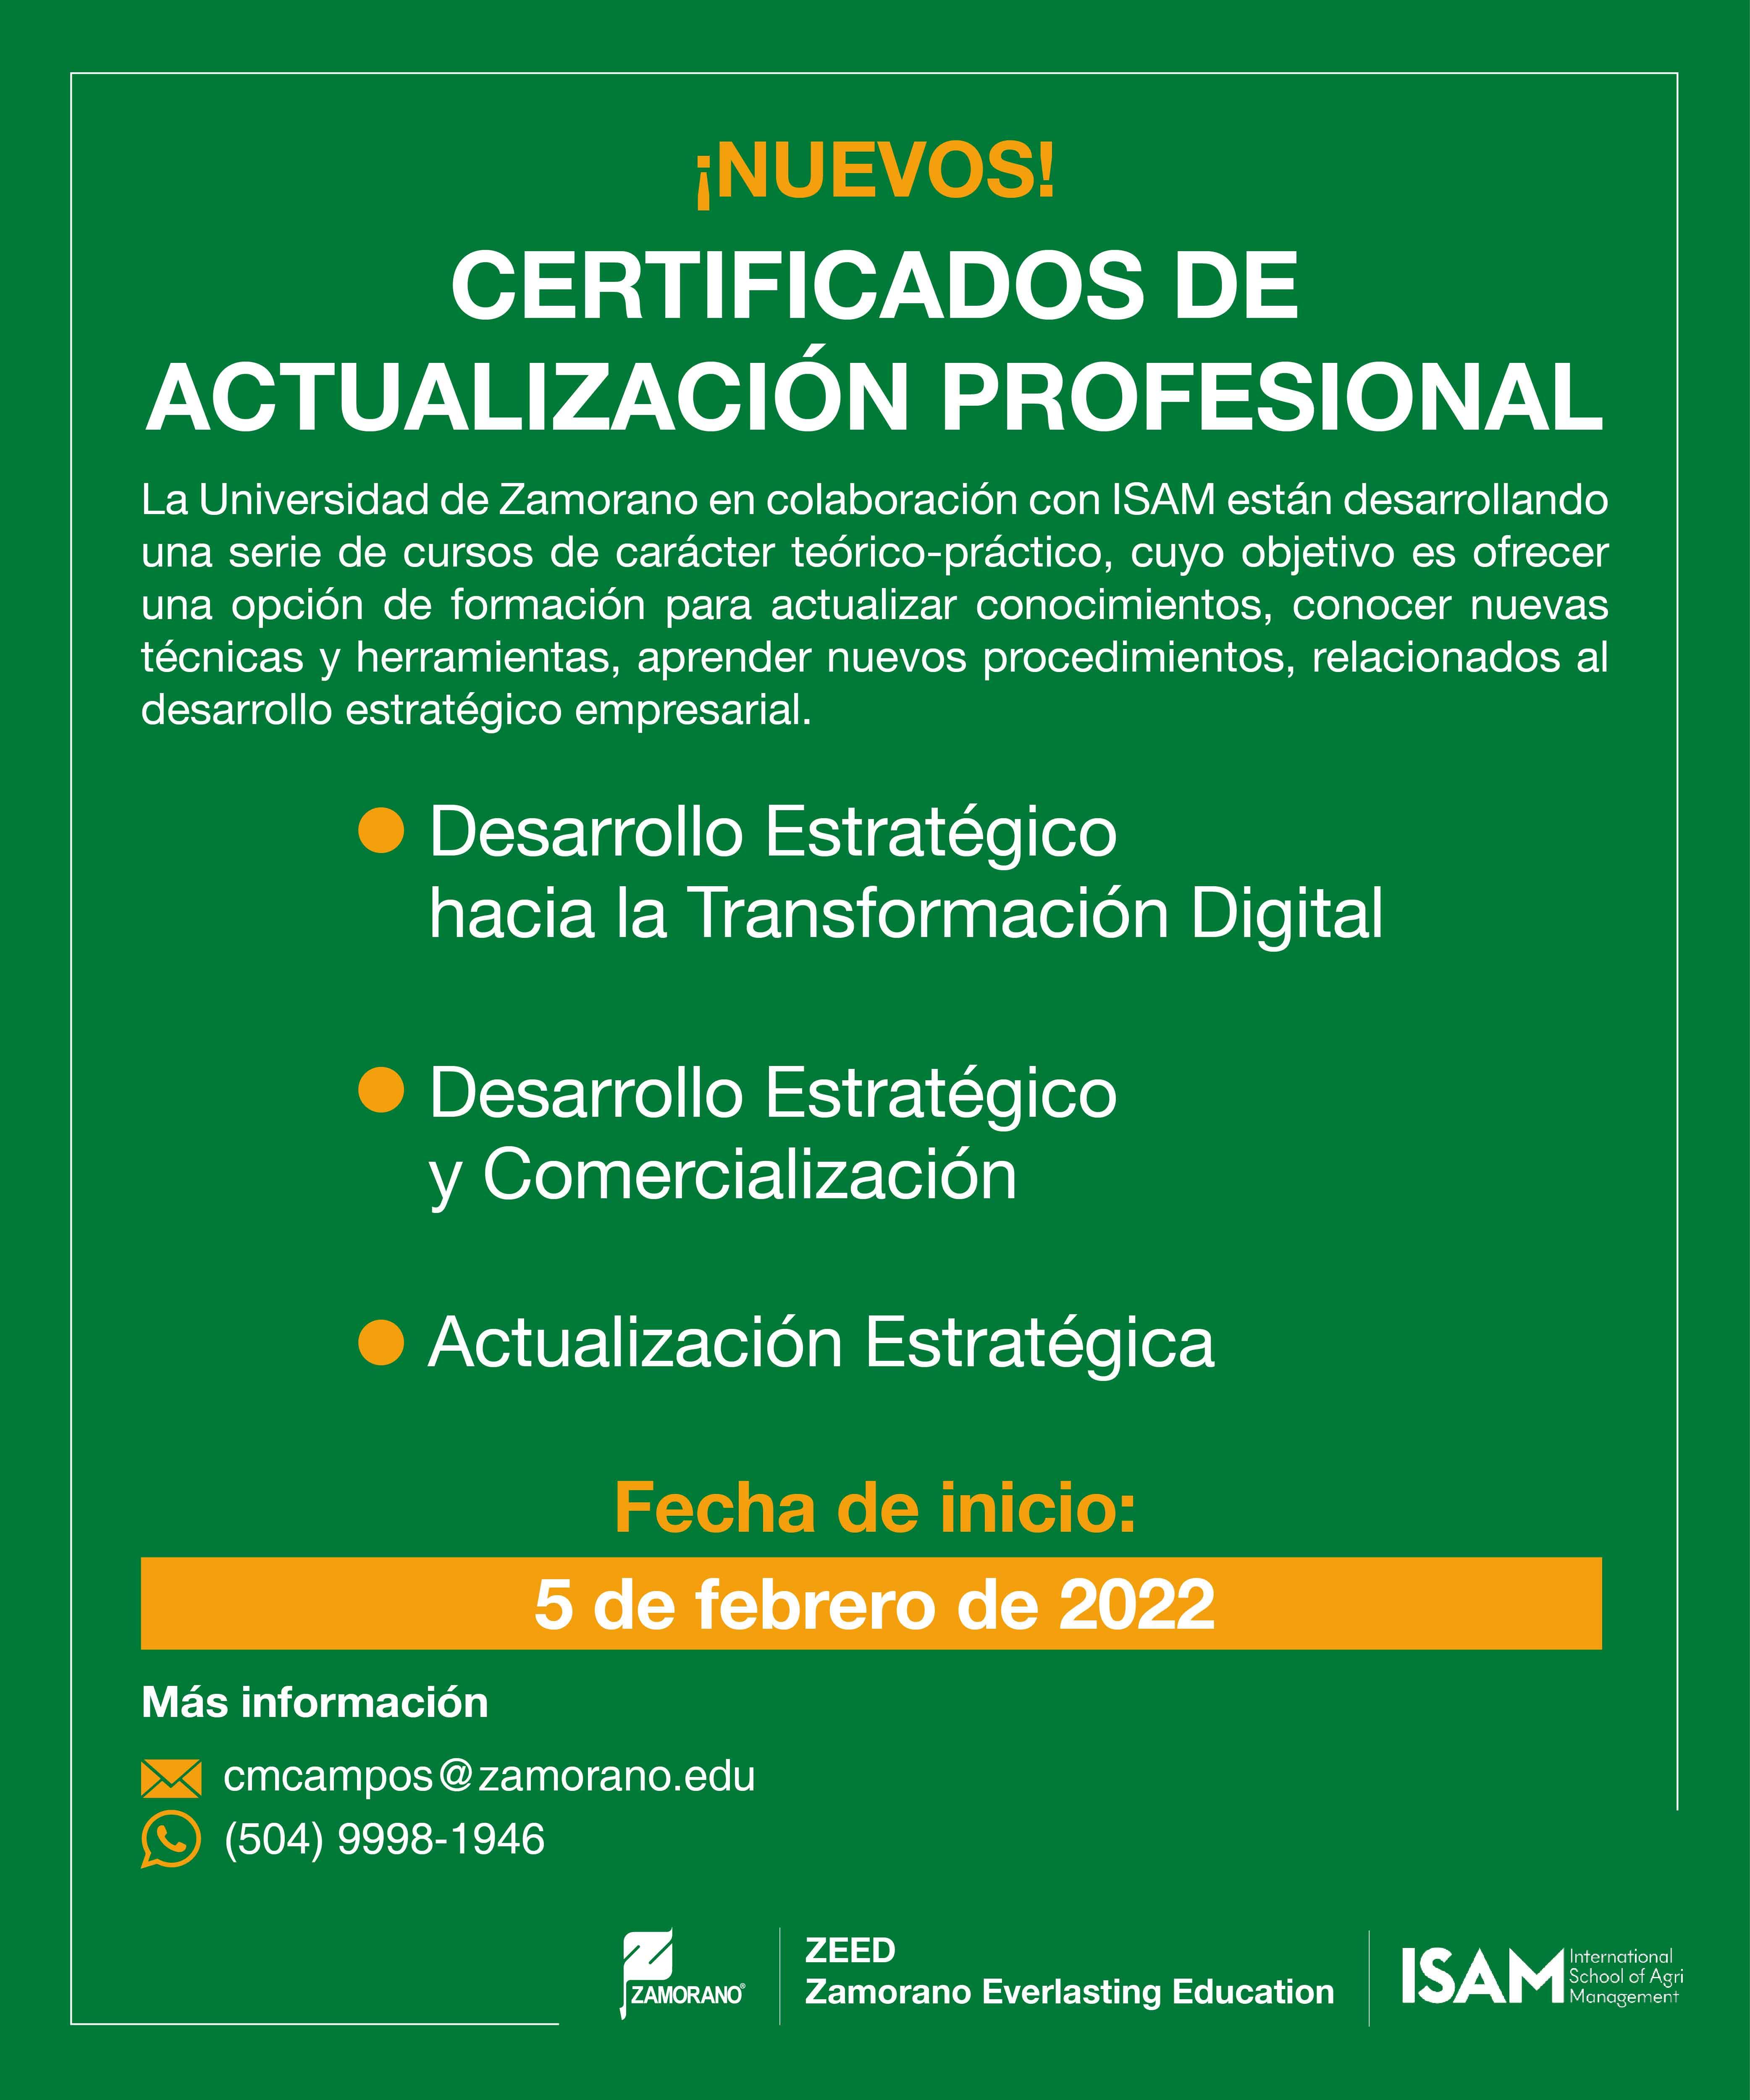 Certificado de Actualización Profesional - Zamorano ISAM-01-1